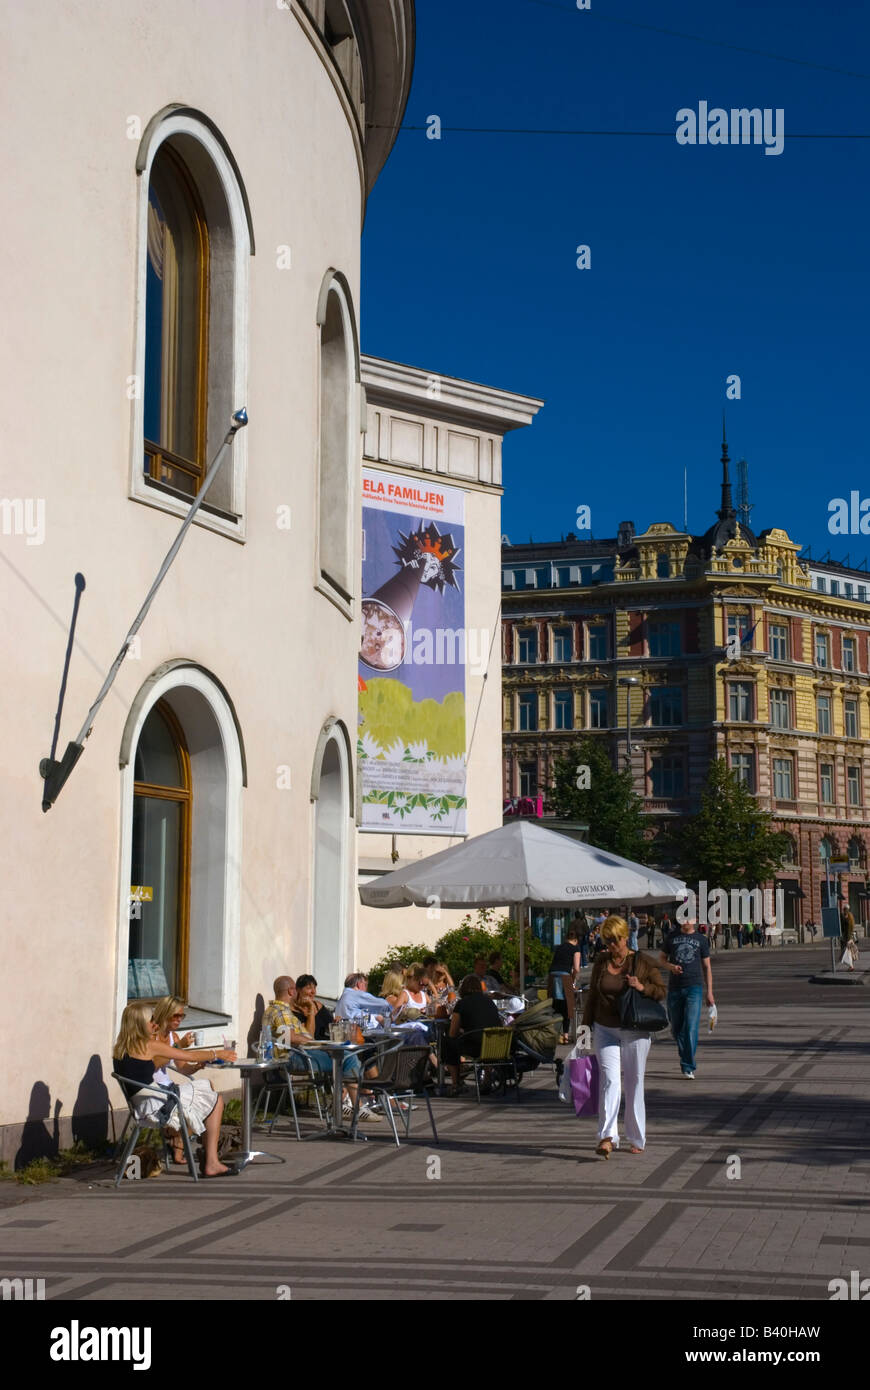 Cafe outside the Svenska teatern the Swedish language theatre along Mannerheimintie in Helsinki Finland Europe - Stock Image